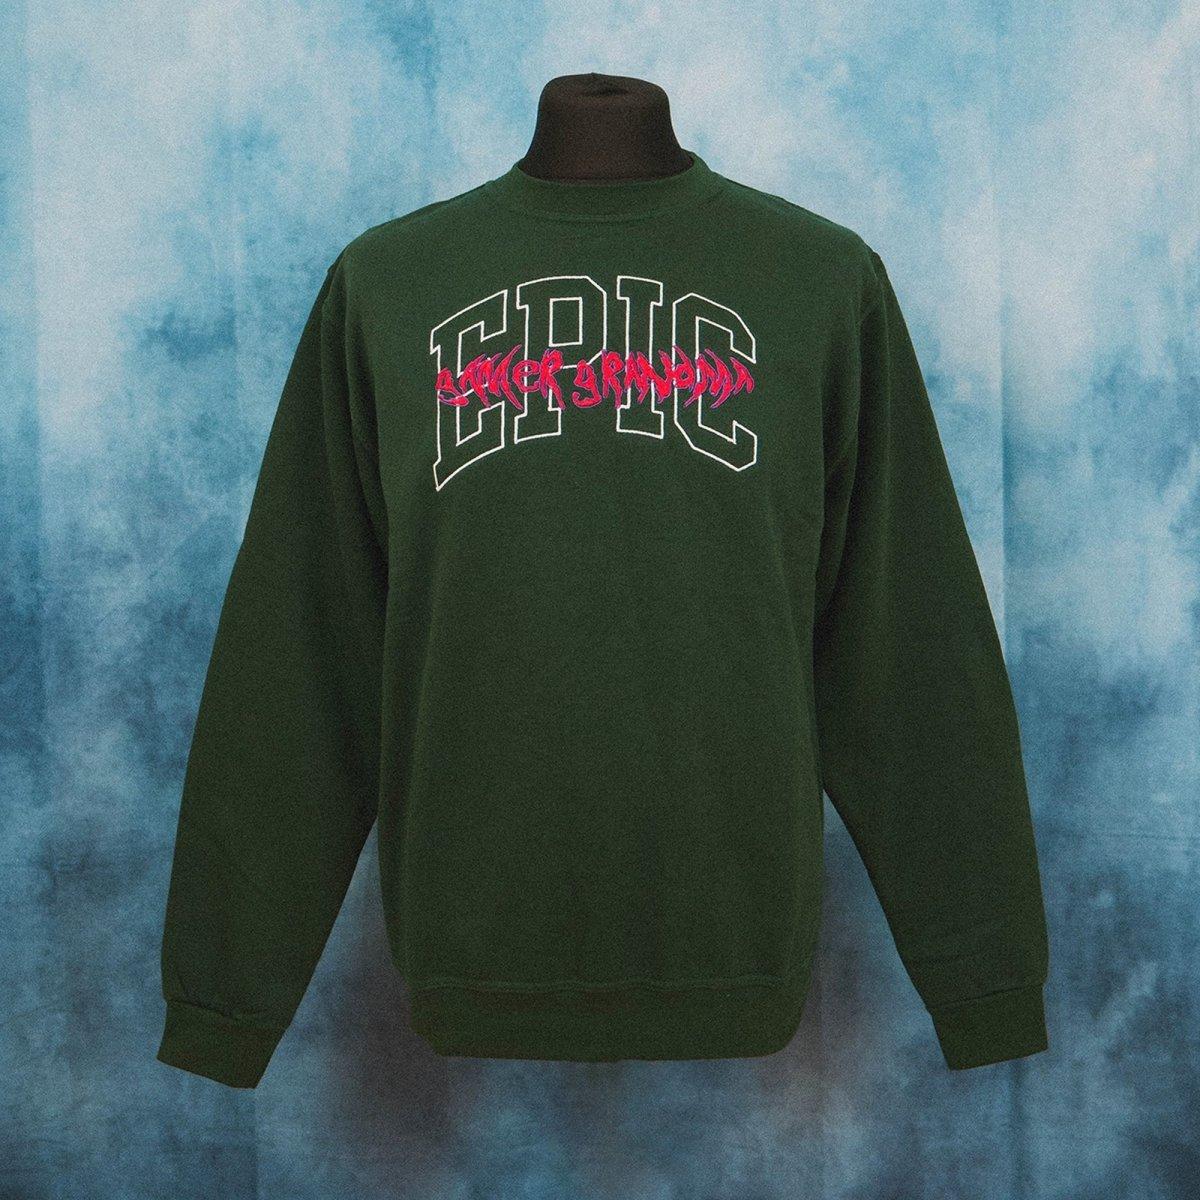 Epic Gamer Grandma - College Dark Green Unisex Embroidered Sweater